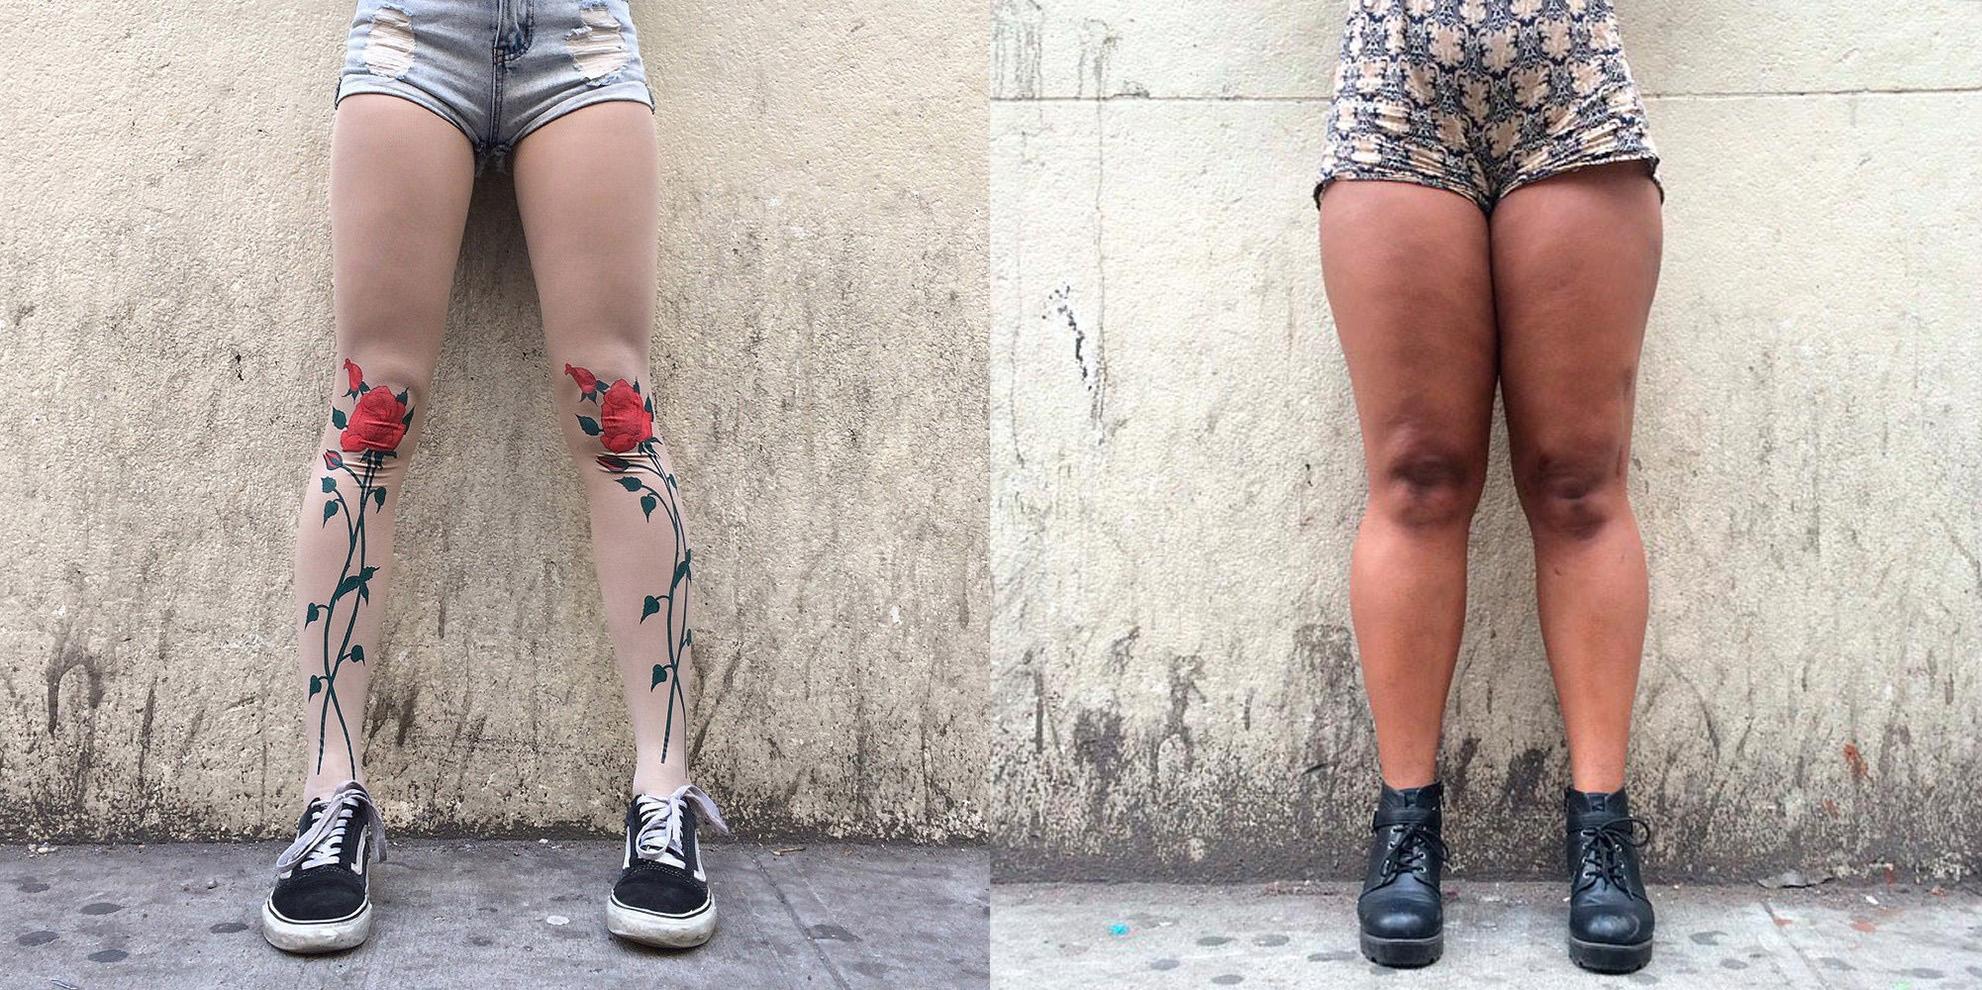 Estas piernas anónimas se han convertido en viral